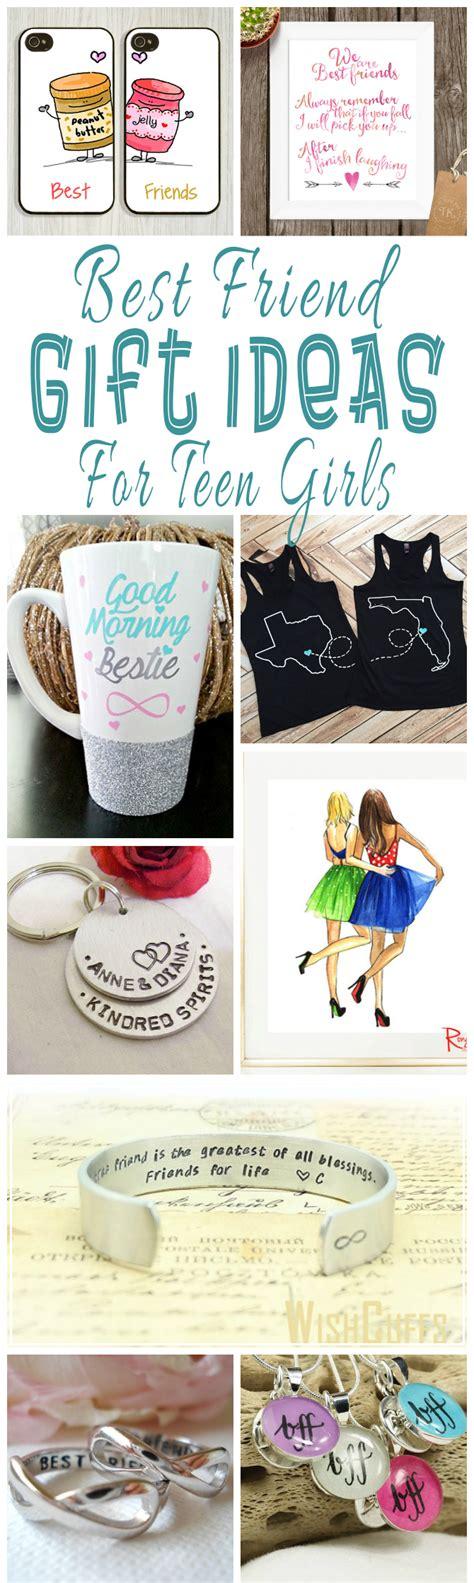 friend gift ideas hative best friends gifts ideas euffslemani Best